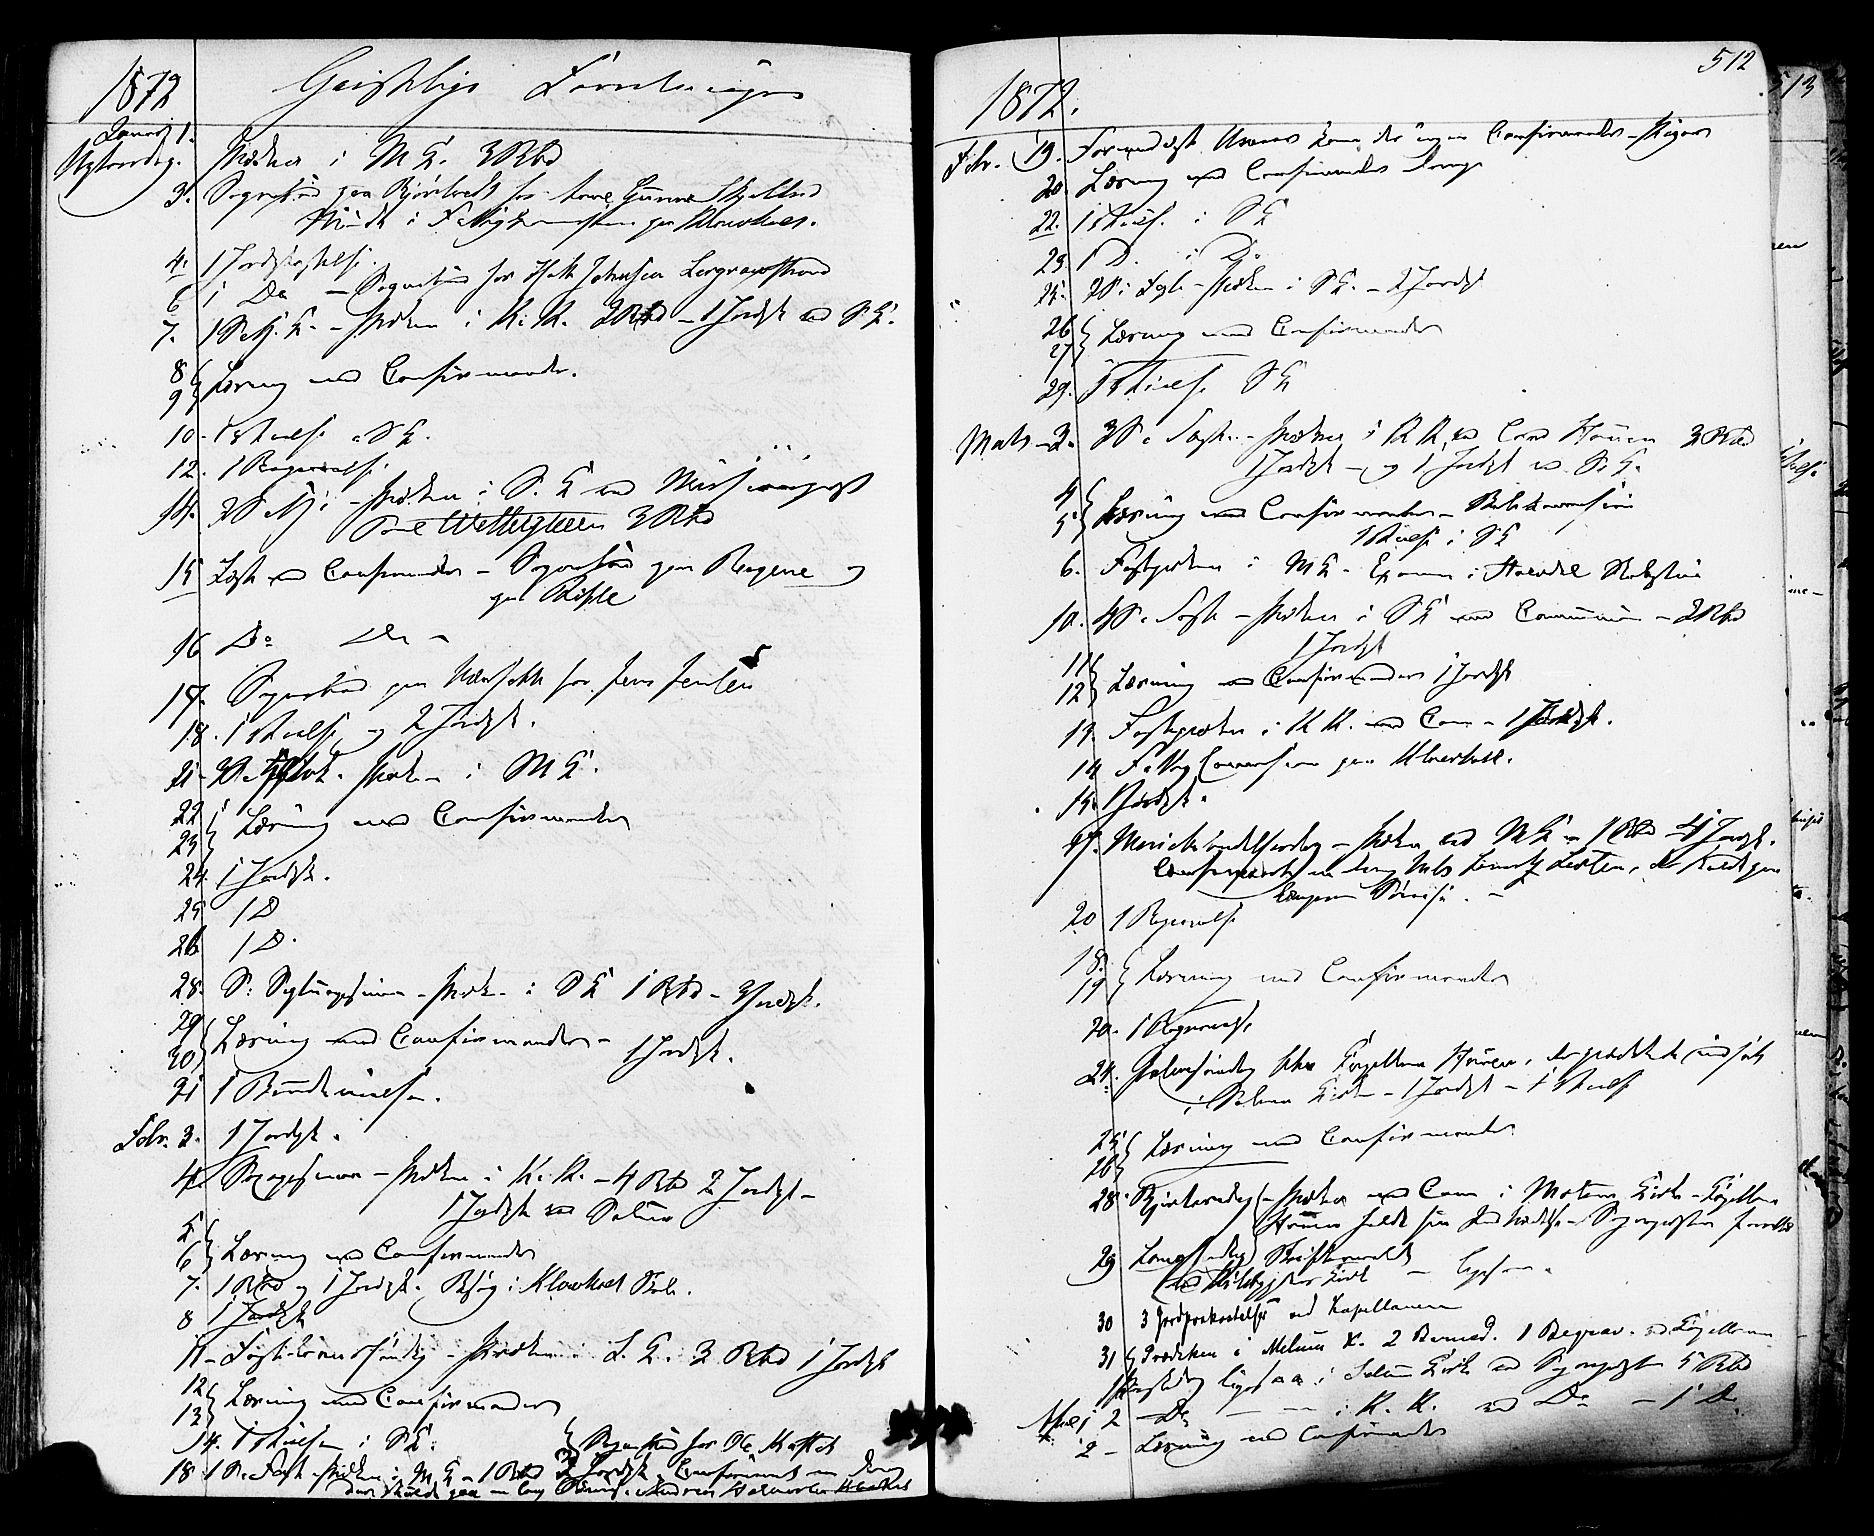 SAKO, Solum kirkebøker, F/Fa/L0008: Ministerialbok nr. I 8, 1865-1876, s. 512